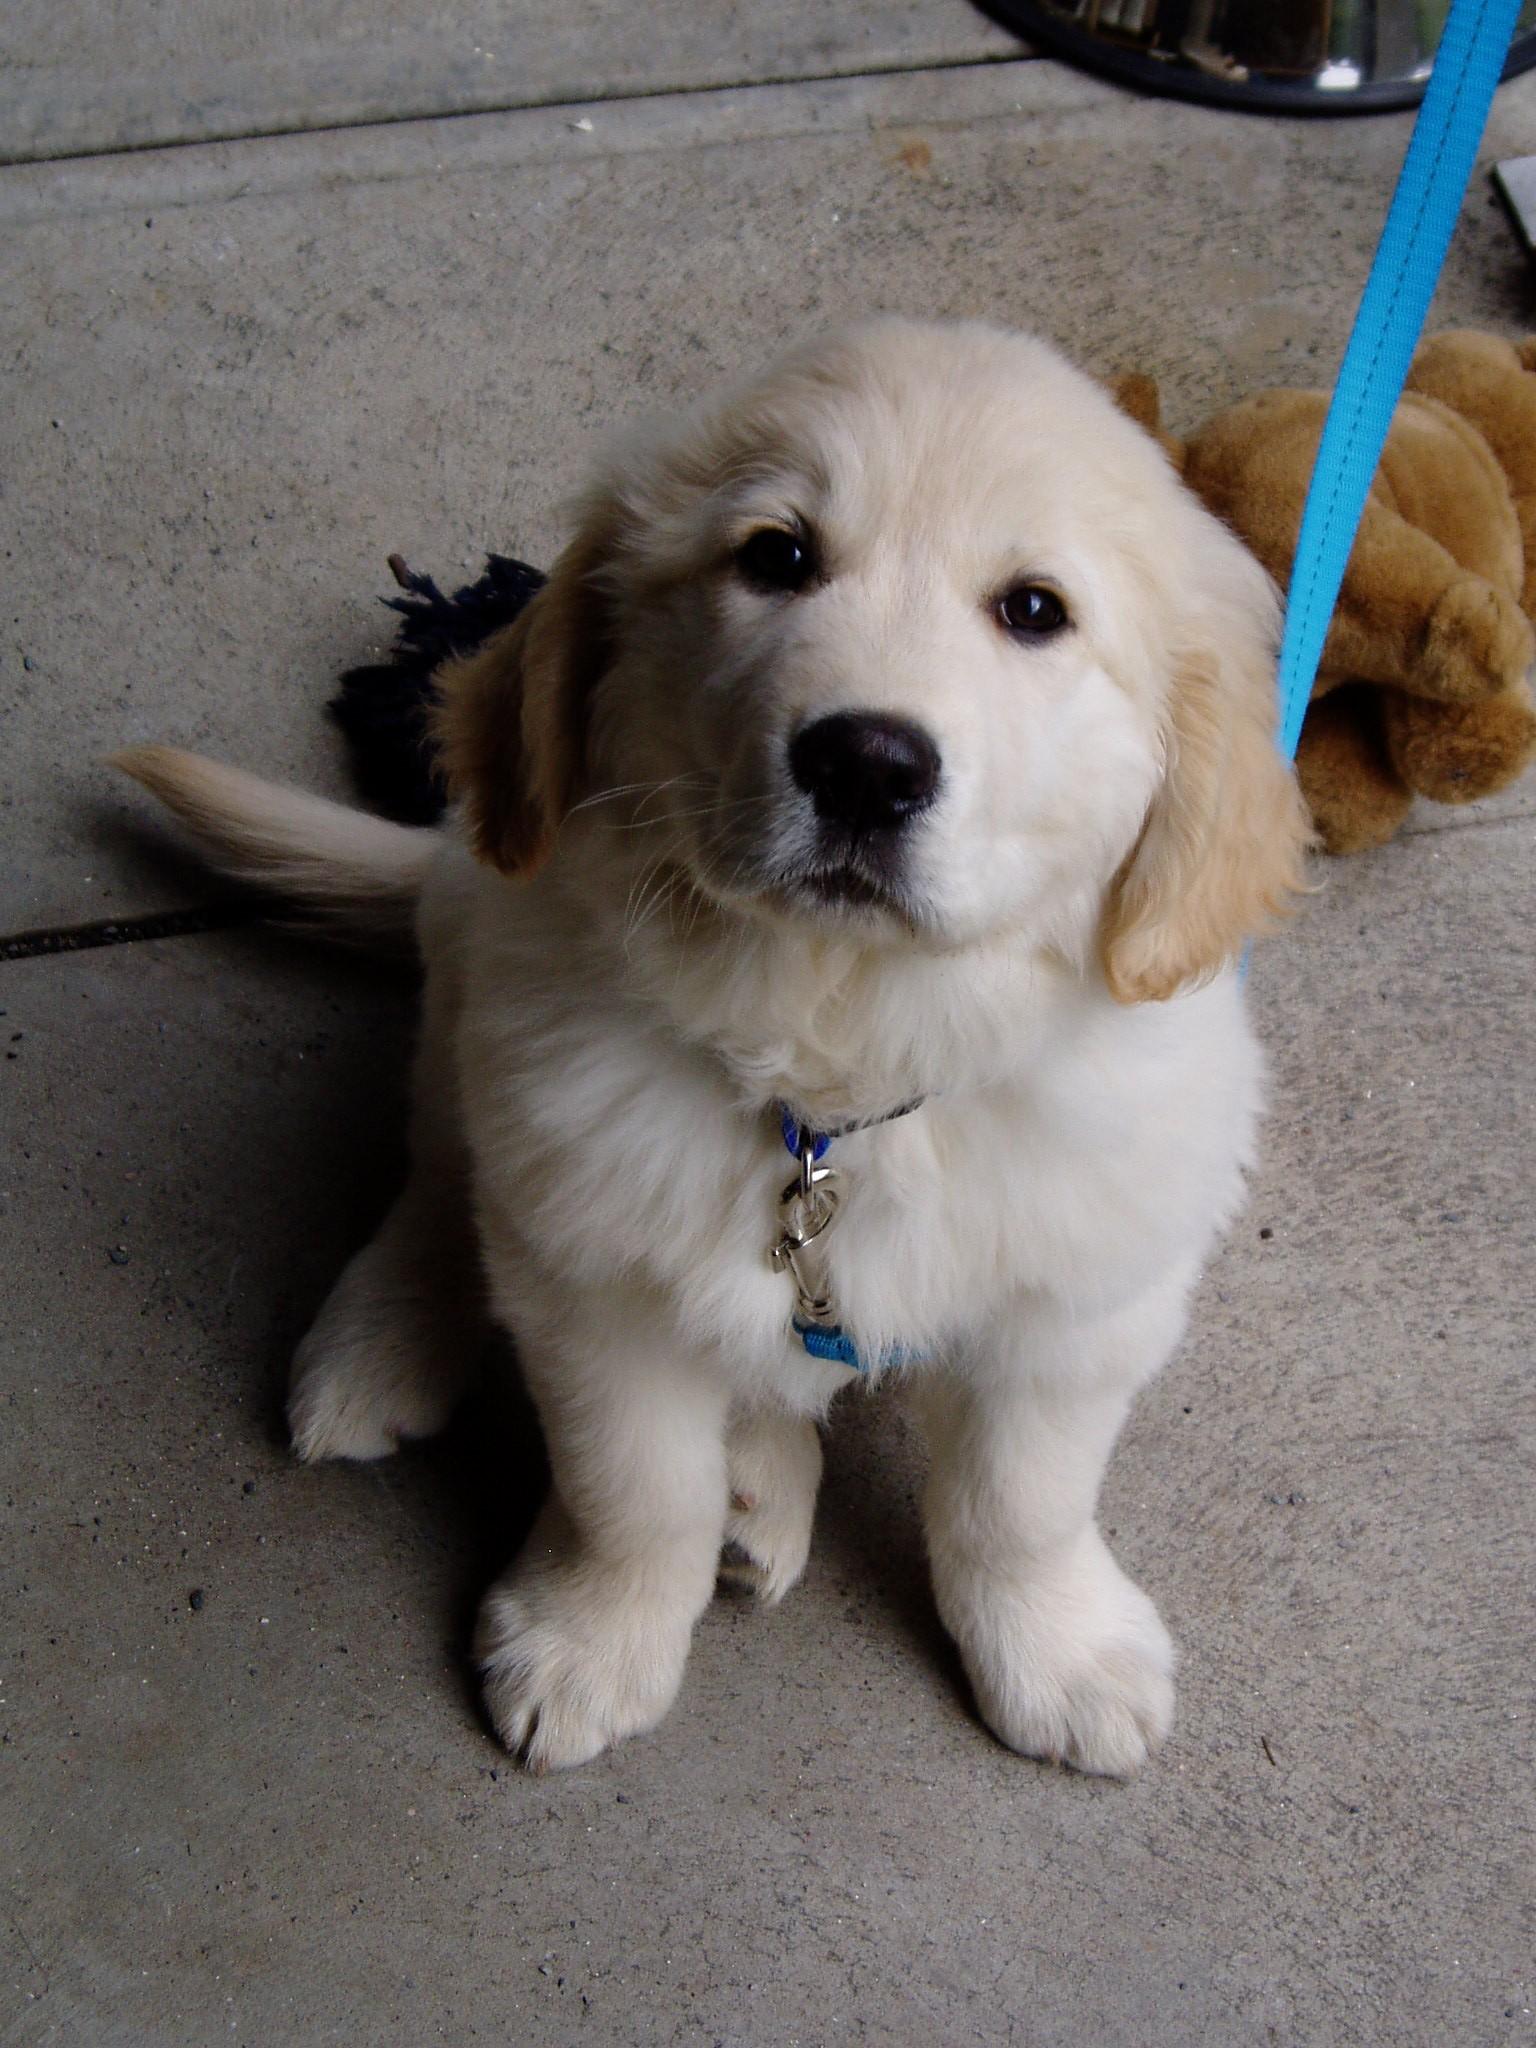 Cute Cream Color Dog Looking at Camera